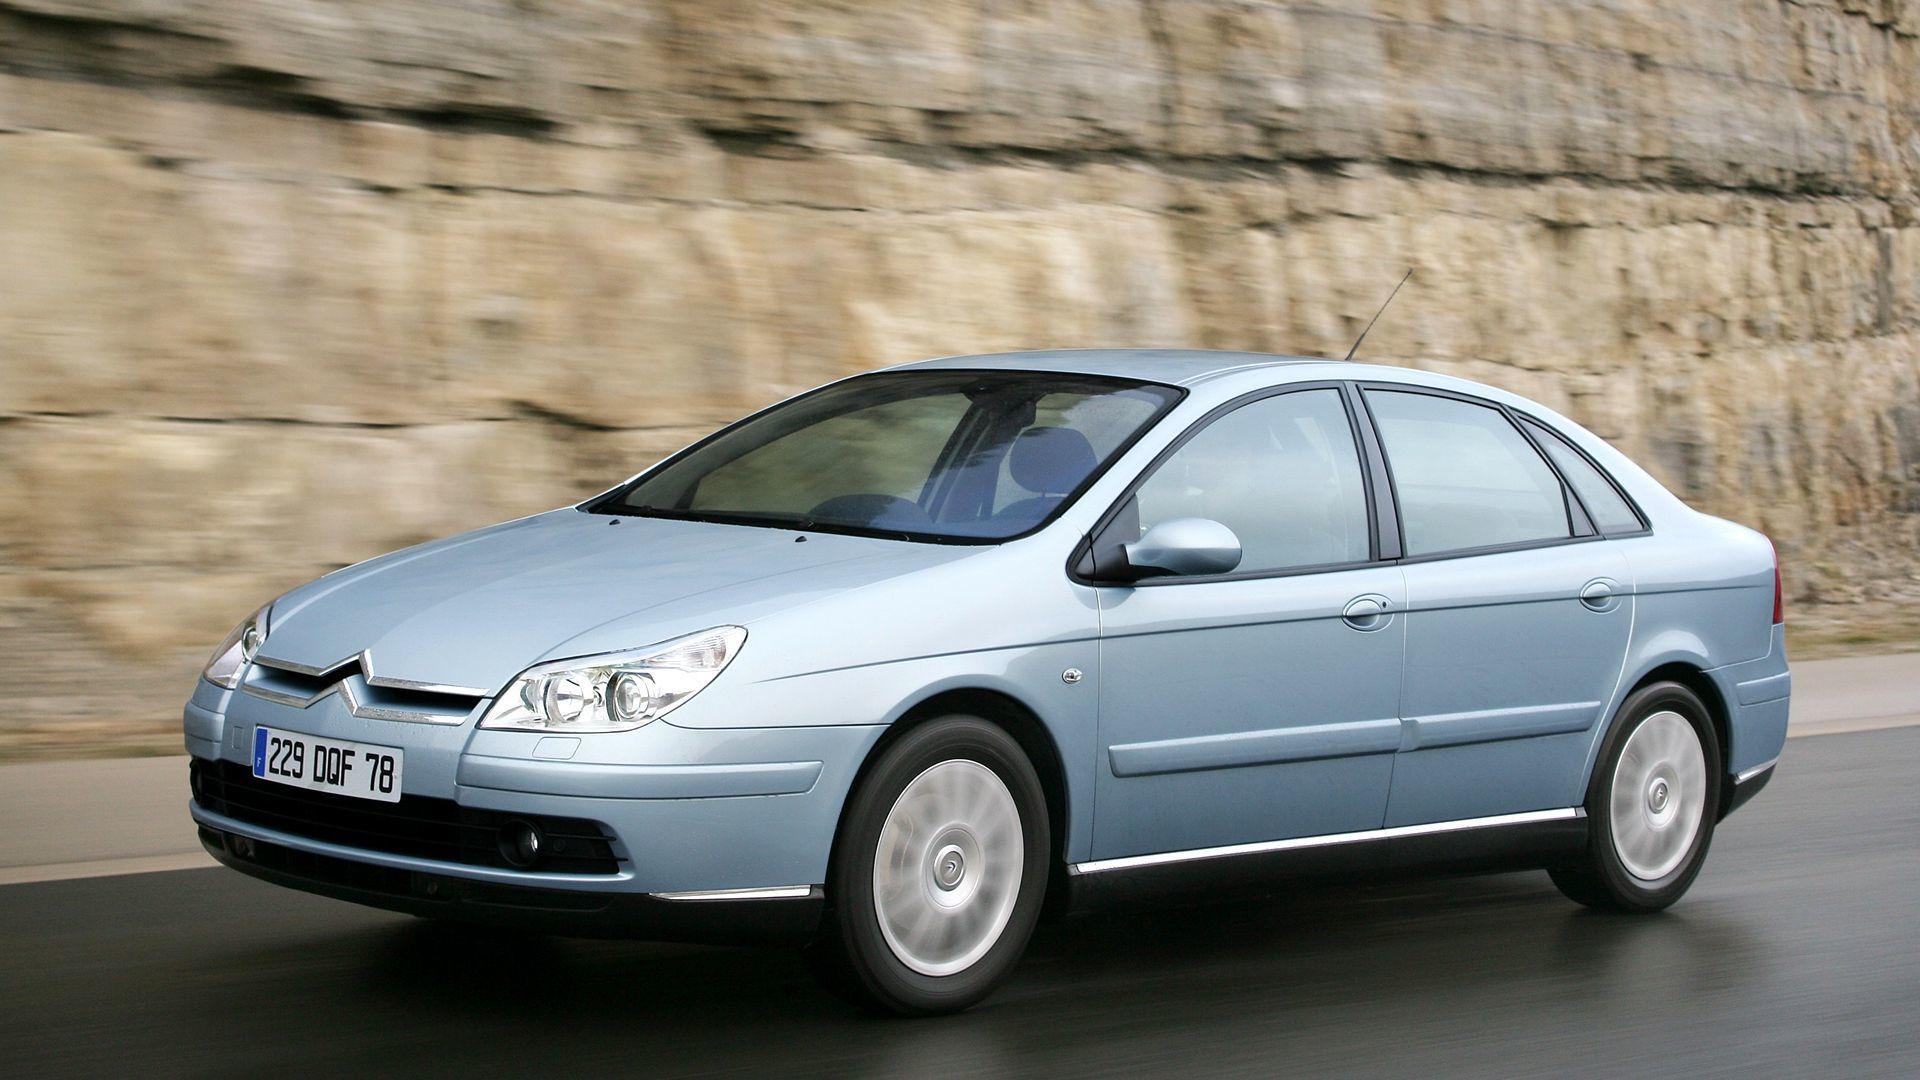 Citroën C5 restyling